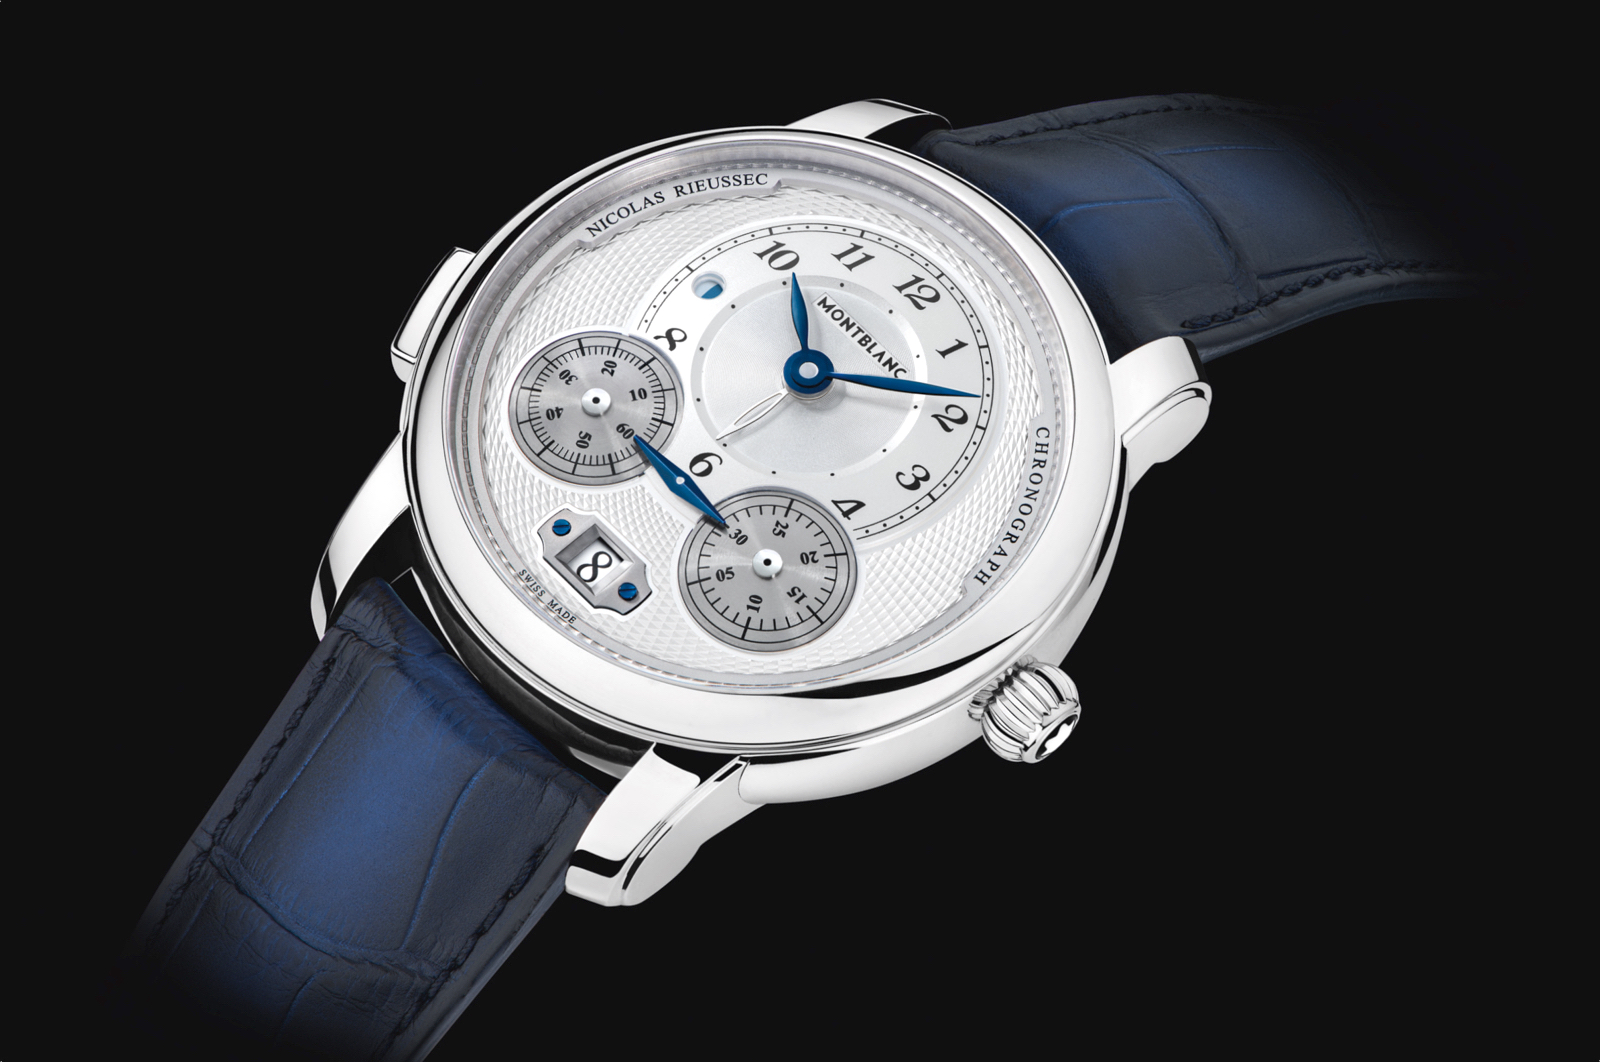 Montblanc Nicolas Rieussec Chronograph 2018